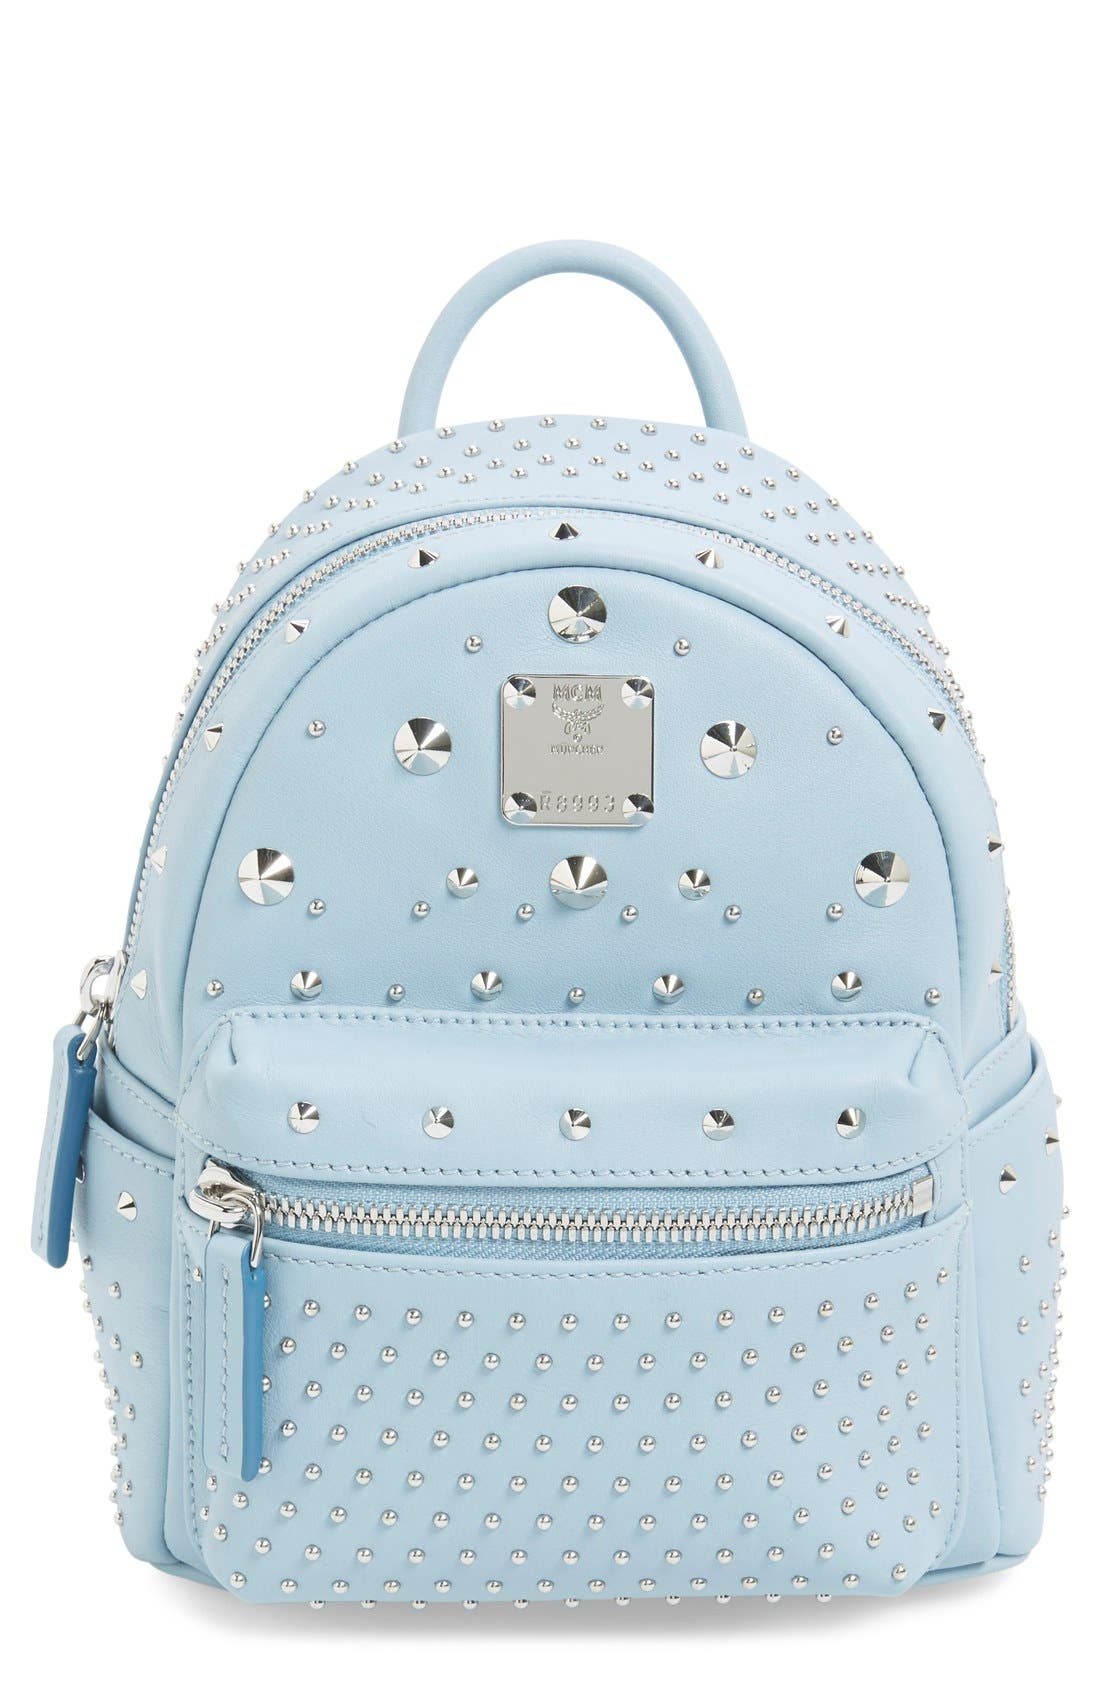 Alternate Image 1 Selected - MCM 'X-Mini Stark - Bebe Boo' Studded Leather Backpack